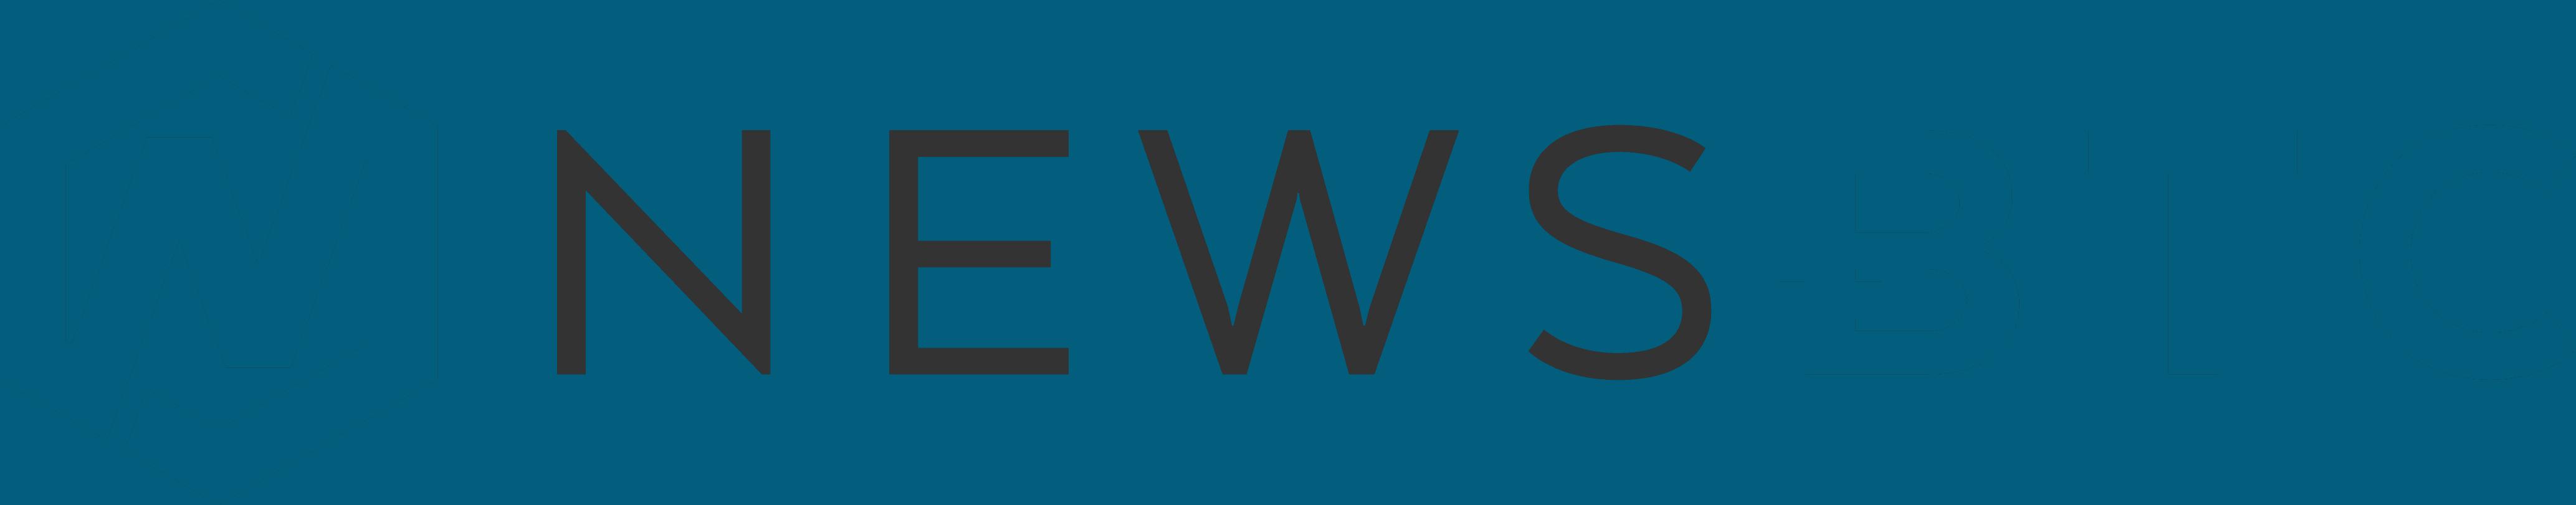 newsbtc logo-min